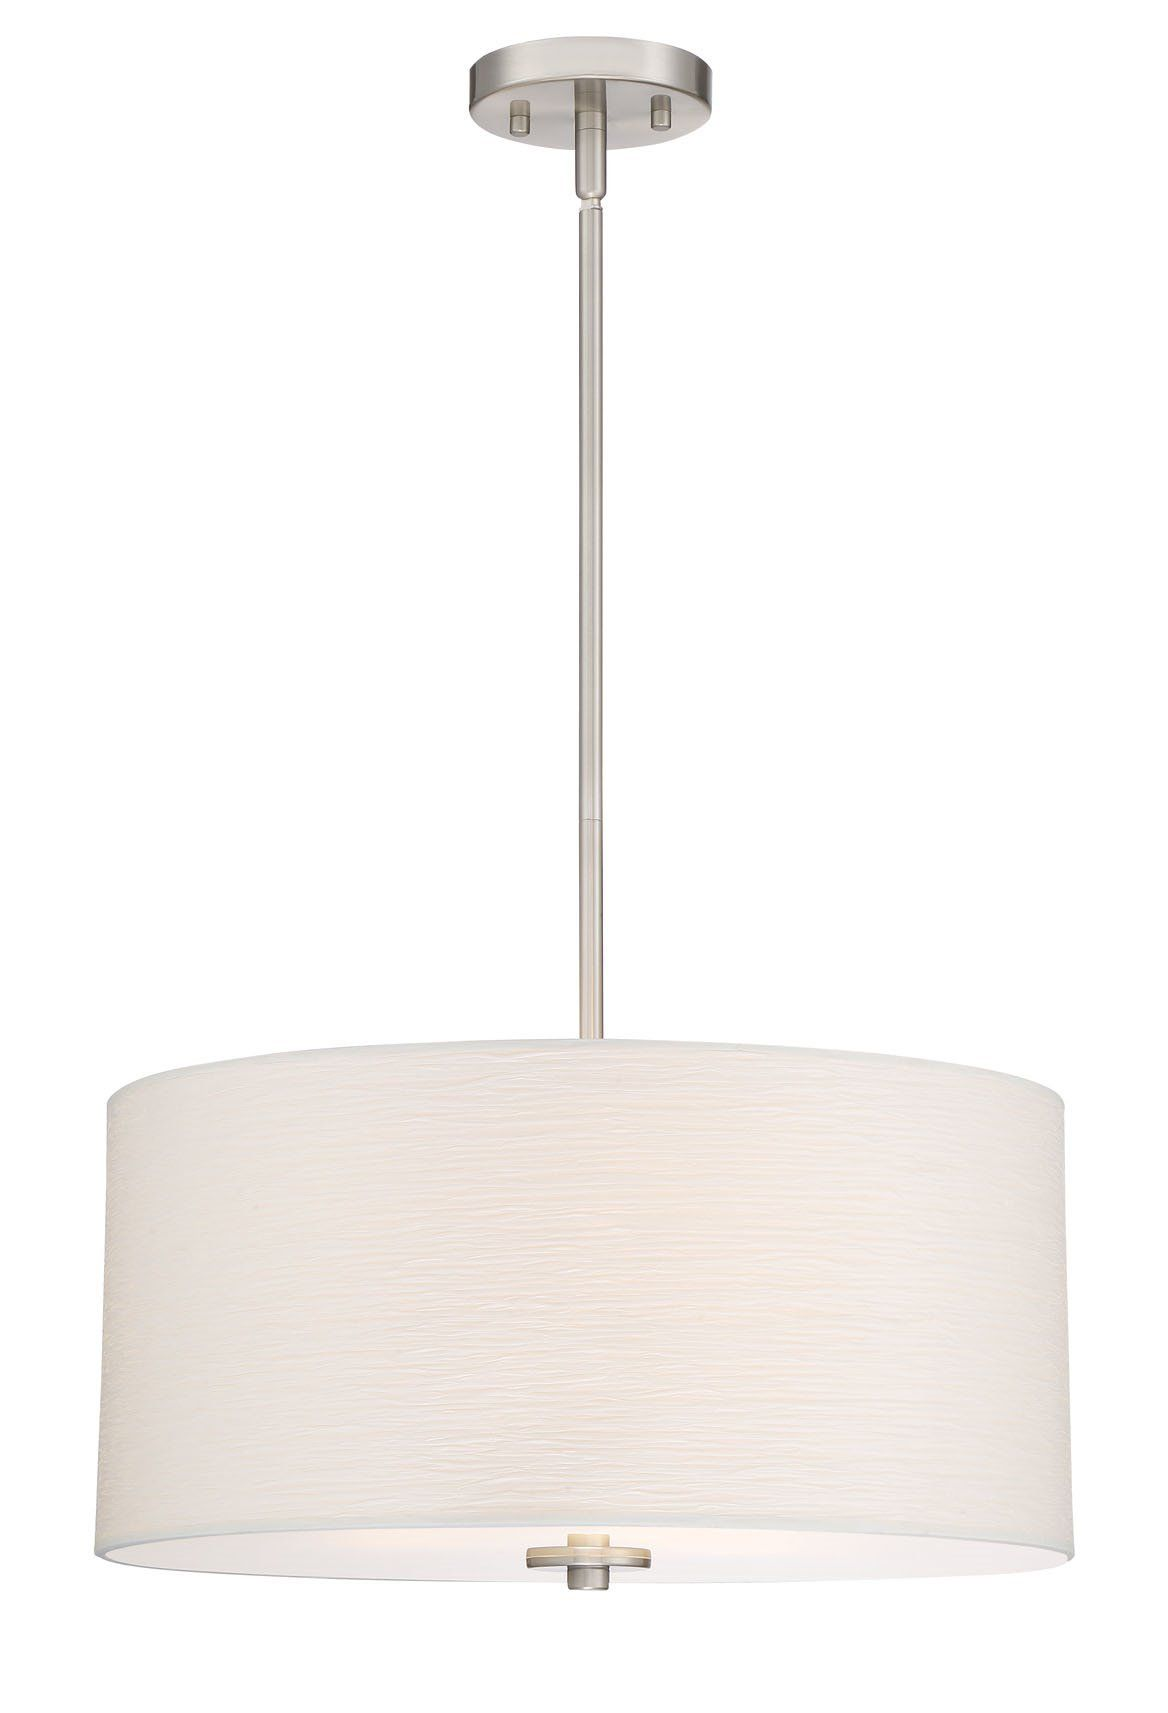 "Revel Pearl 18"" Contemporary 3 Light Drum Chandelier Glass"